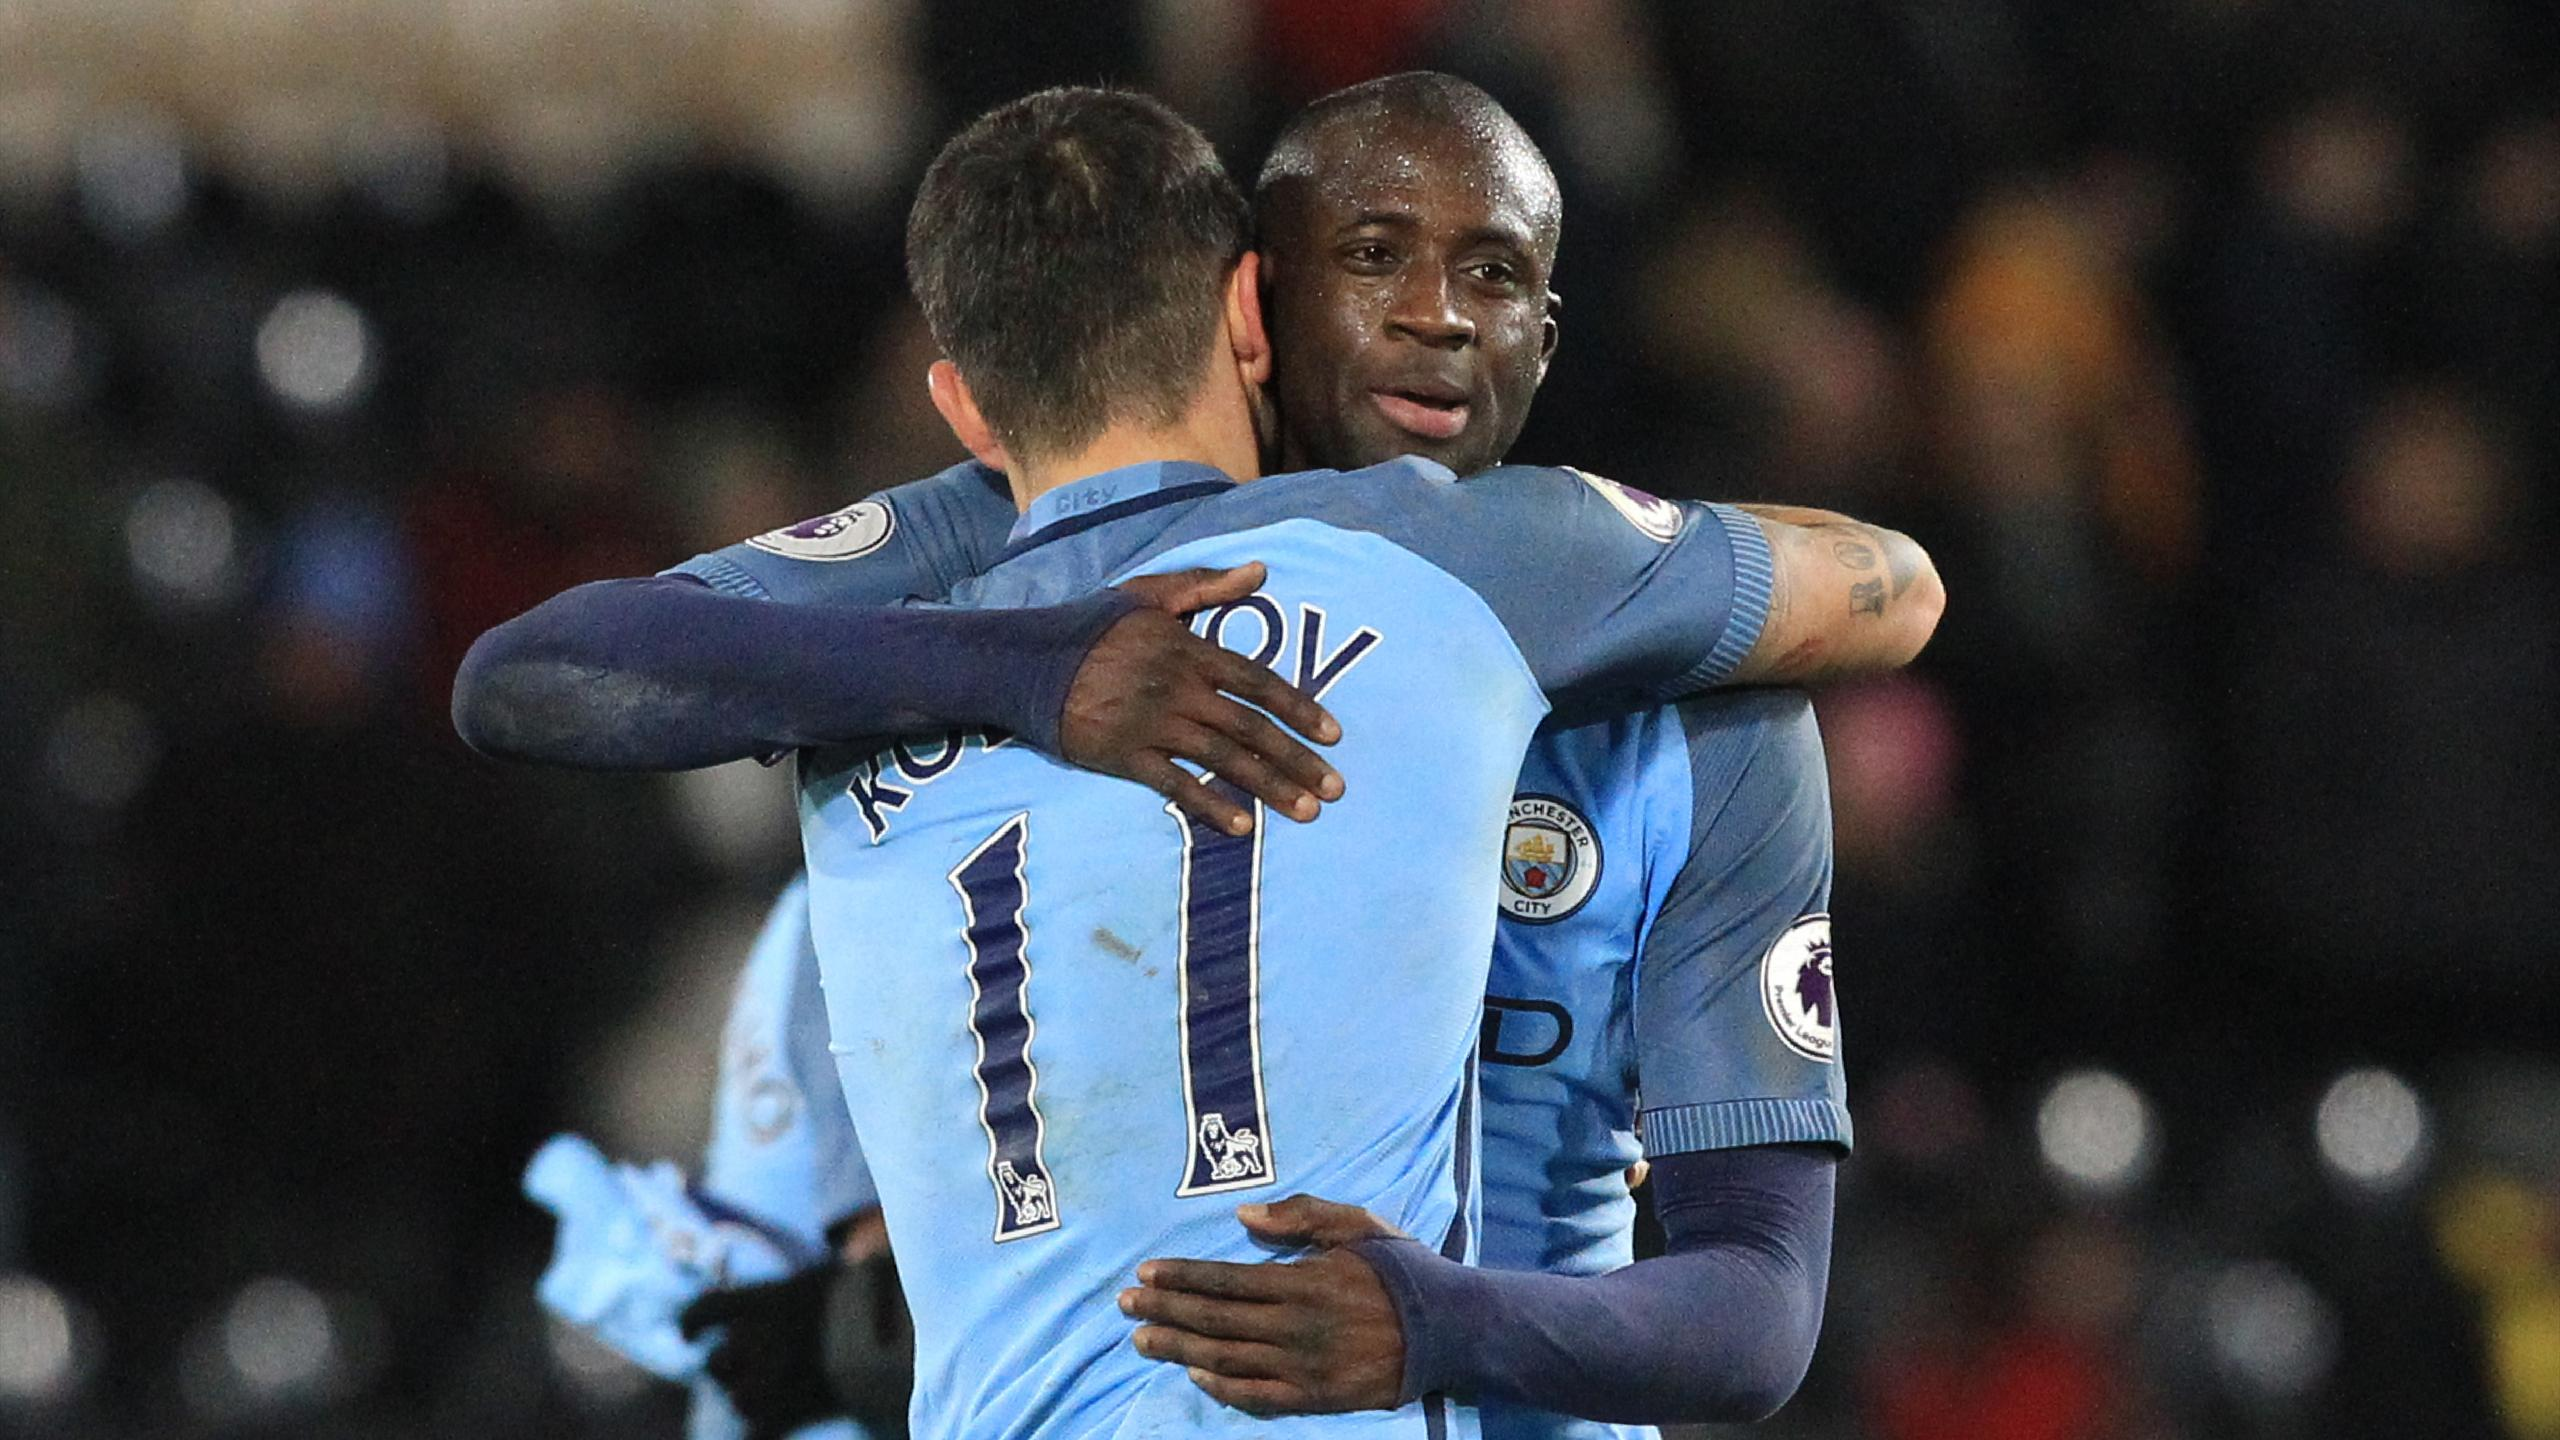 Manchester City's Ivorian midfielder Yaya Toure (R) embraces Manchester City's Serbian defender Aleksandar Kolarov (L)